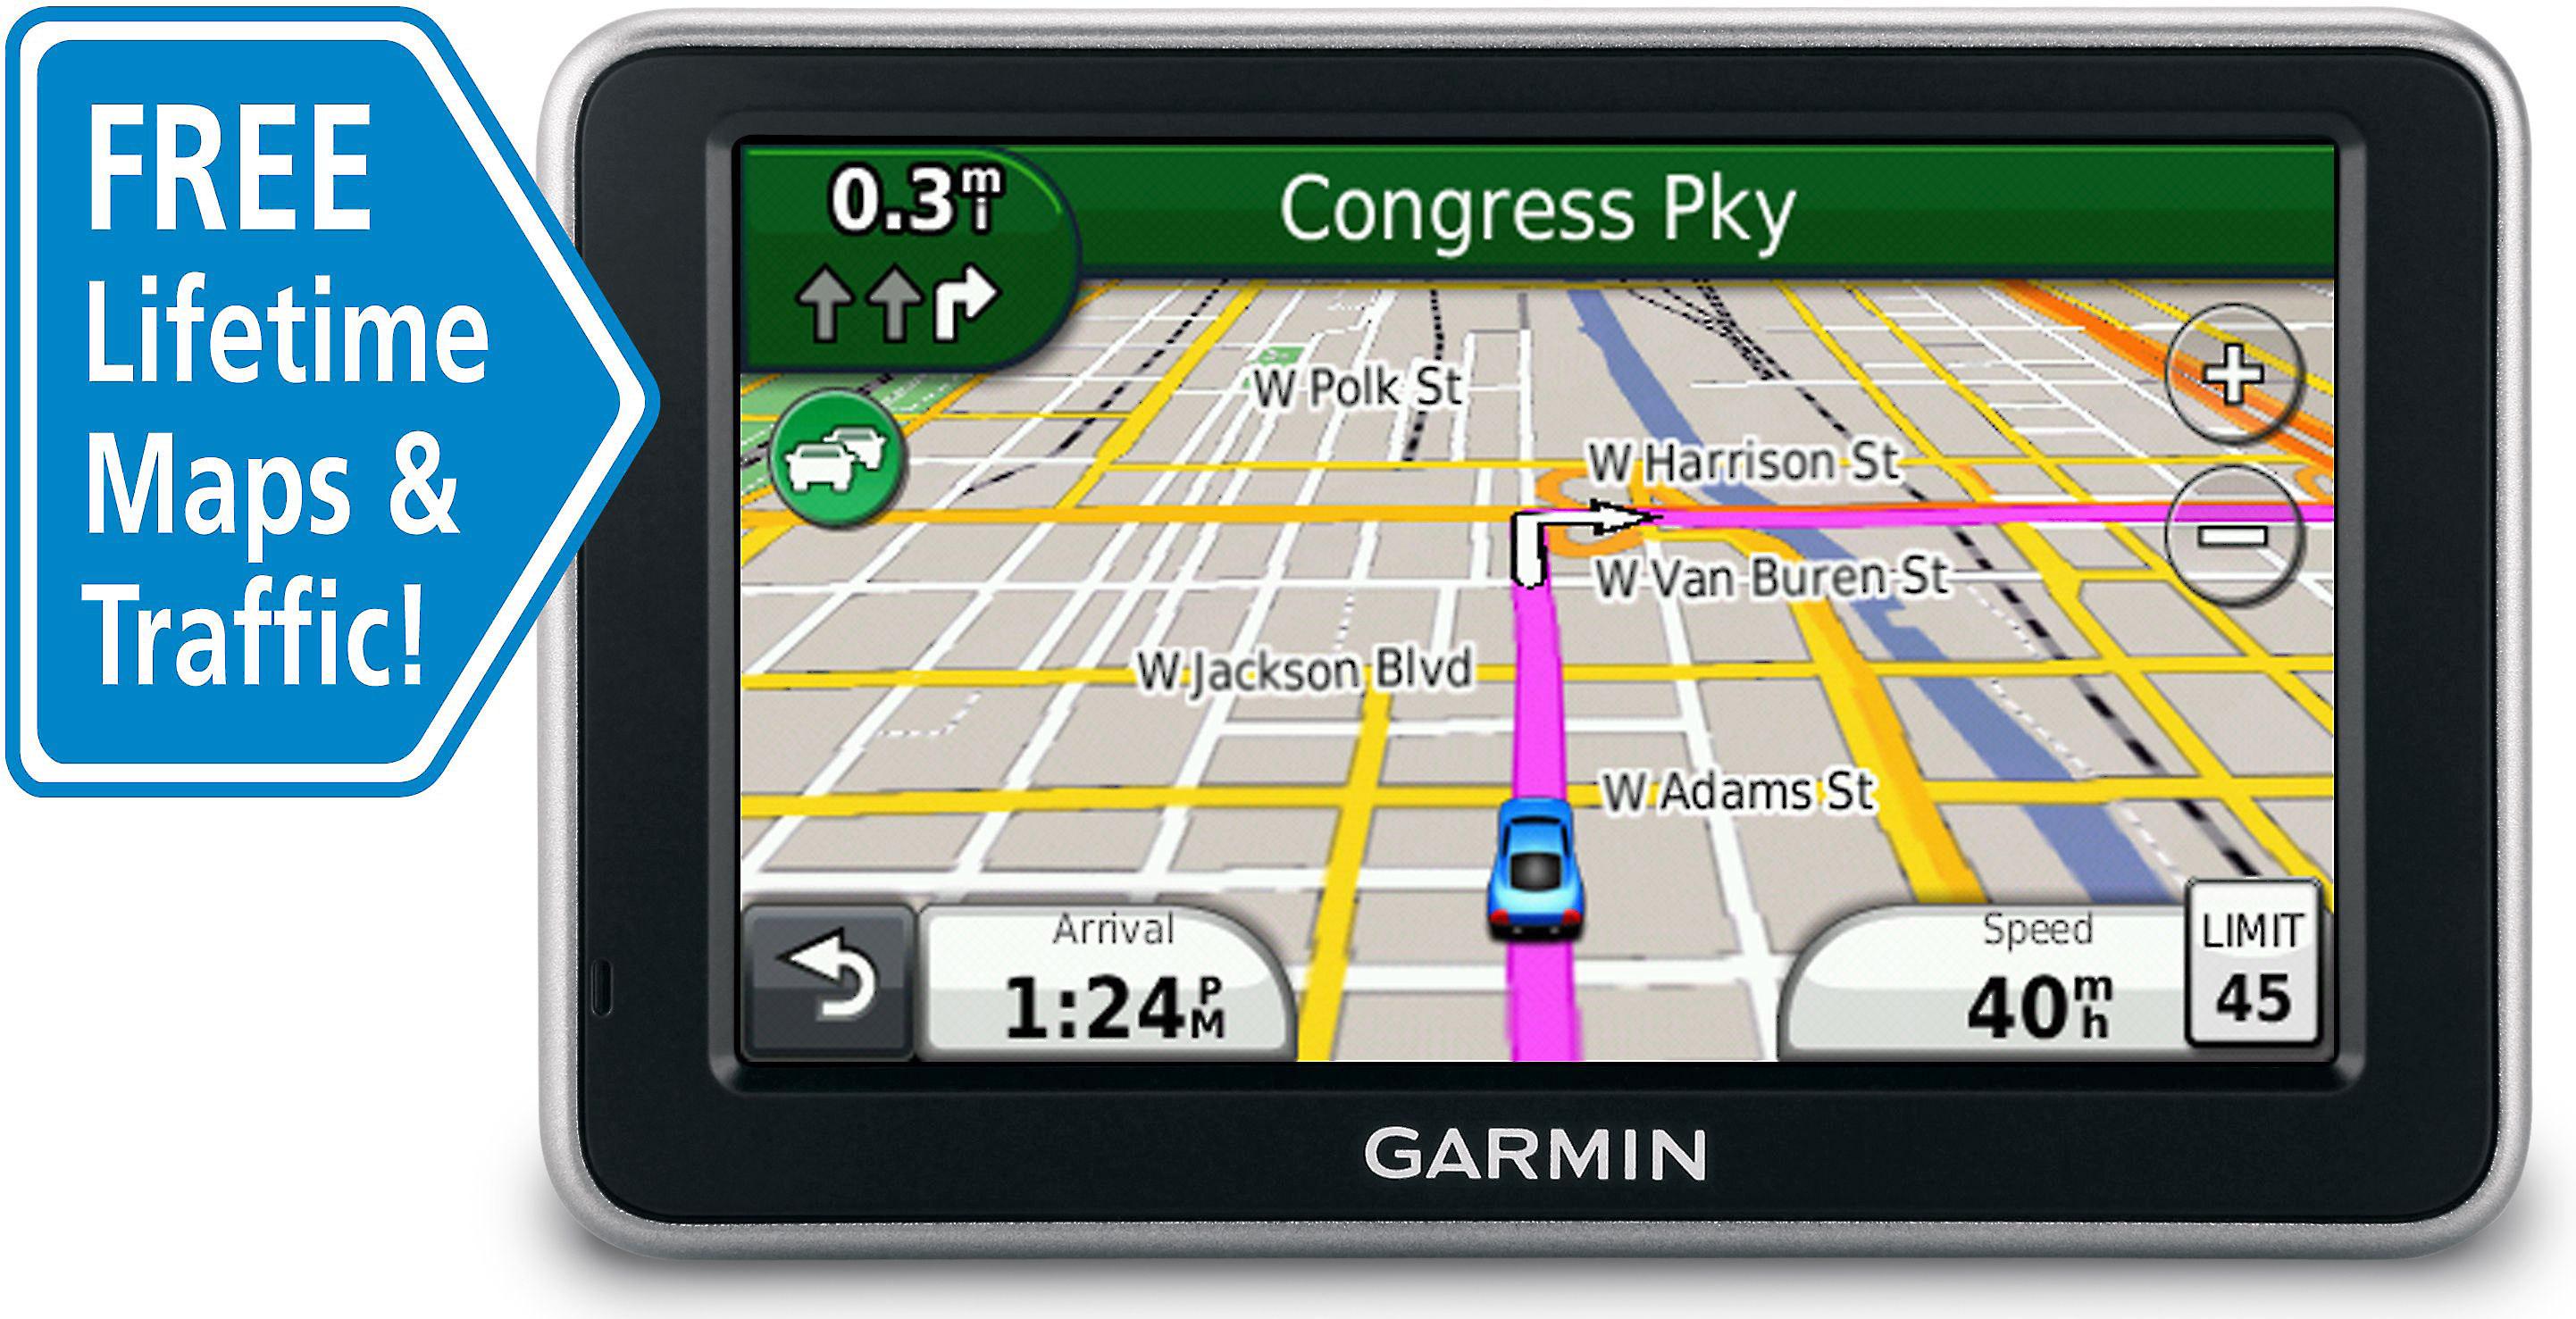 Garmin nüvi® 2350LMT Portable navigator with free lifetime traffic on